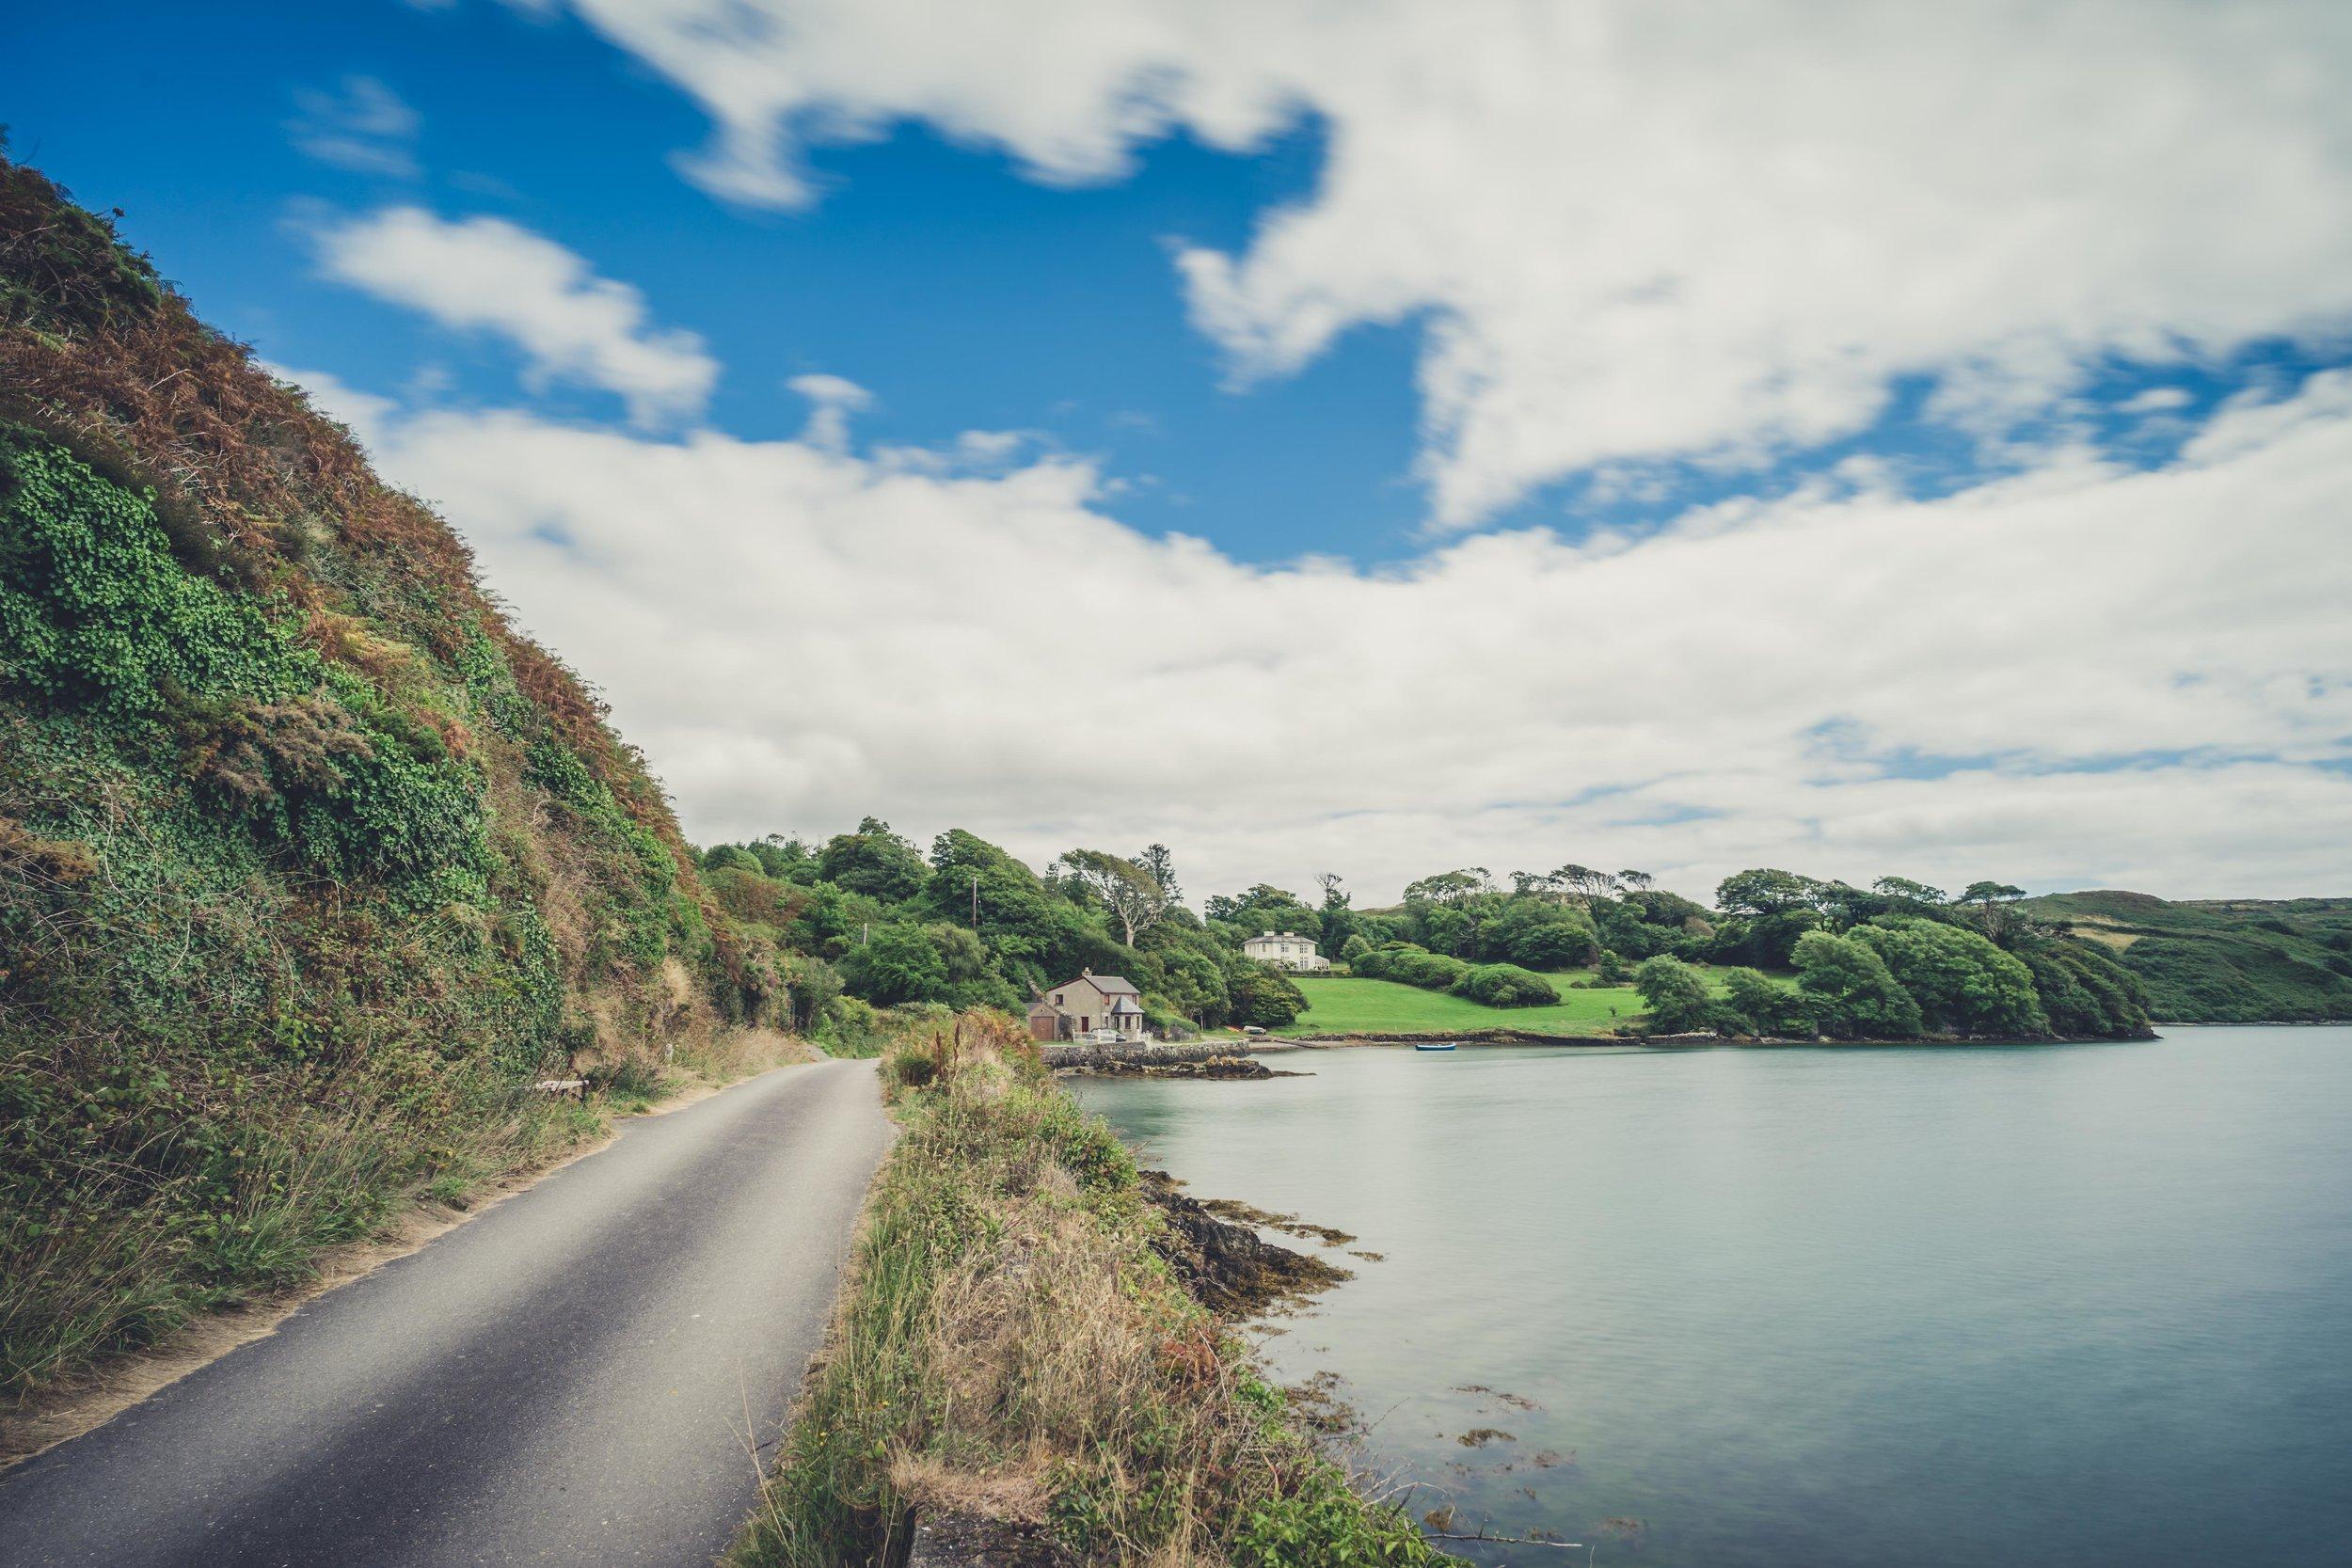 county cork. cork. ireland. irish. history. city. house sitting. old. travel. travel photography. travel photographer. lough hyne. hiking. outdoor. adventure. hiking. road to house.jpg